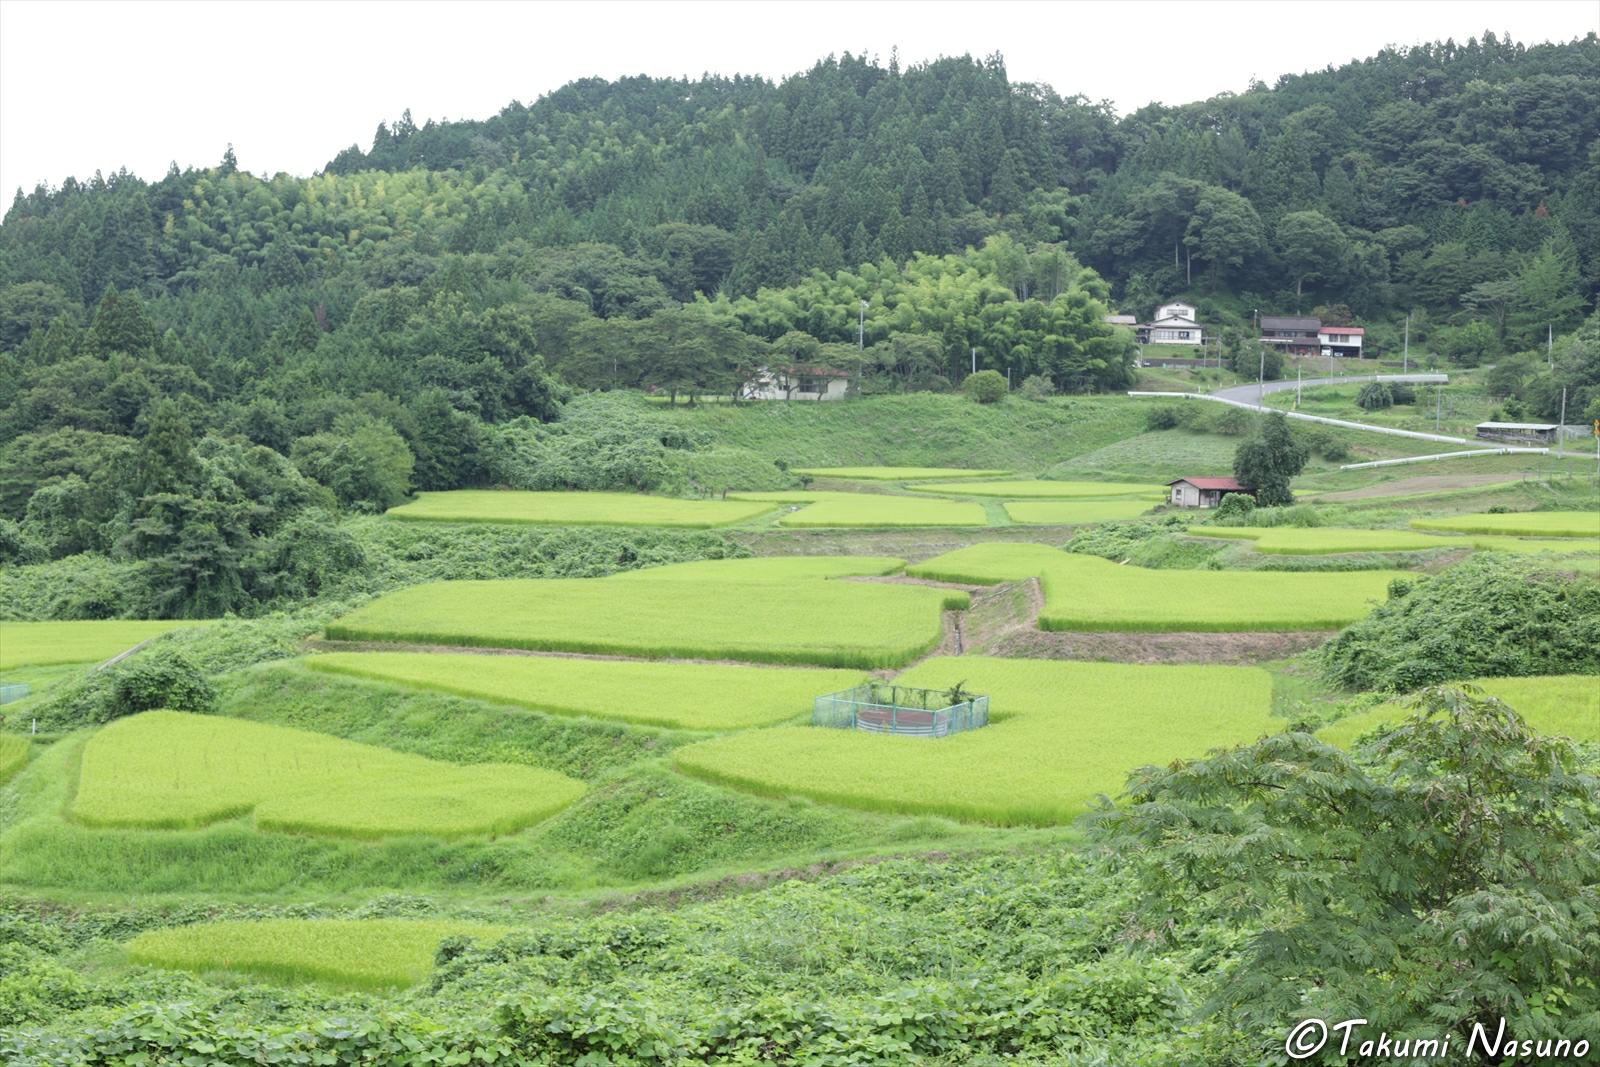 Paddy Fields from Fukuoka District of Tanagura Town